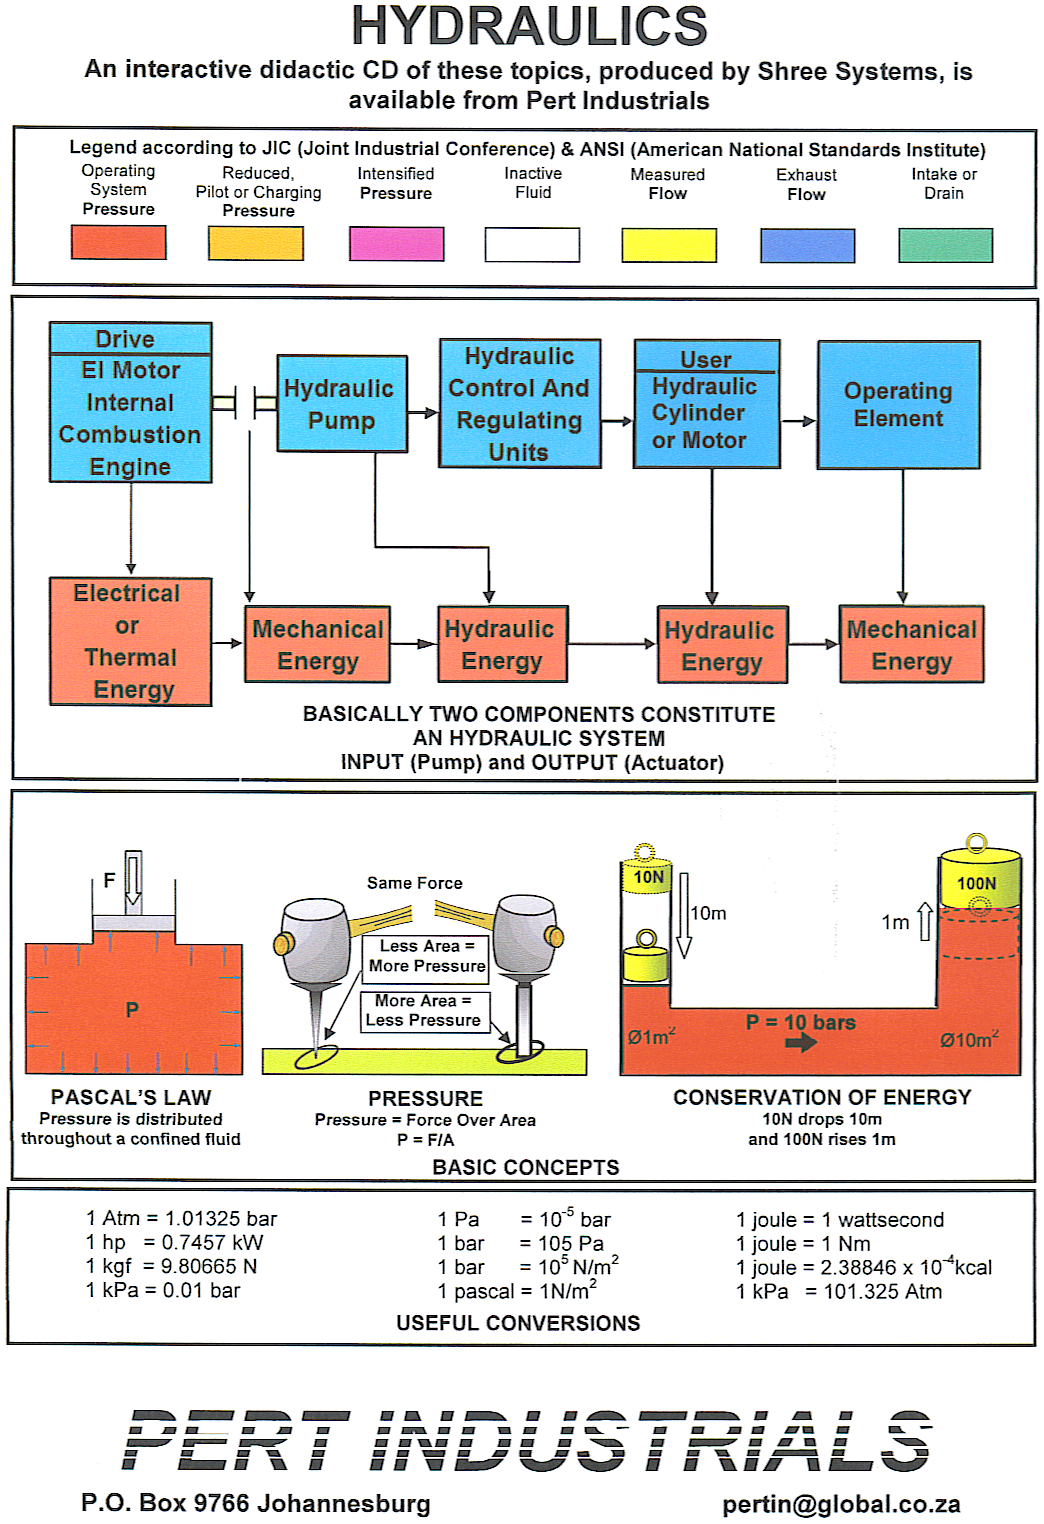 HP4-1 Hydraulics Wall Chart.png